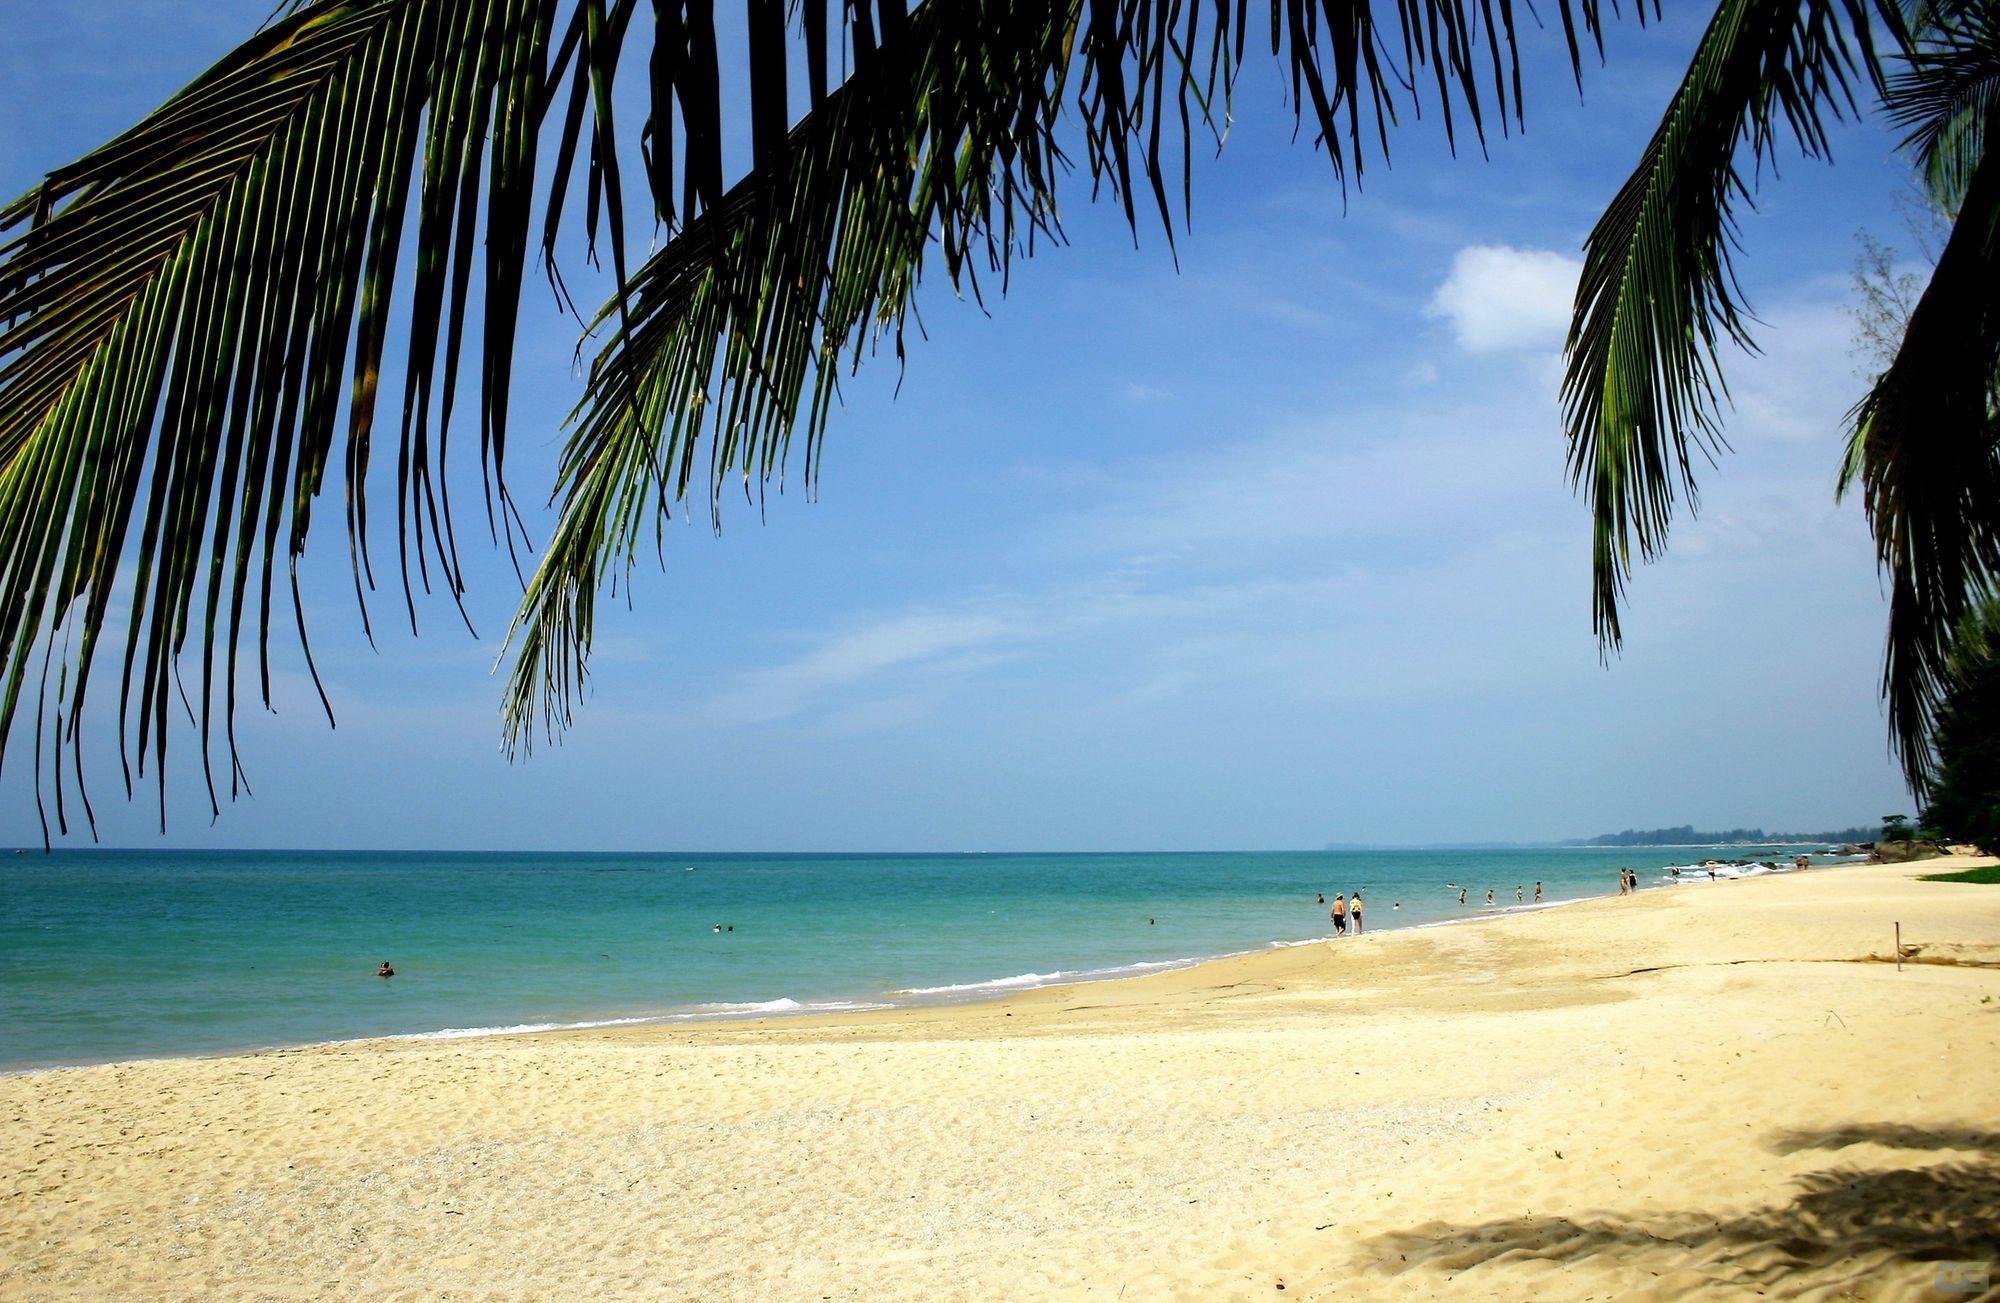 10 Best Beaches in Koh Phangan: Thailand Beaches Guide